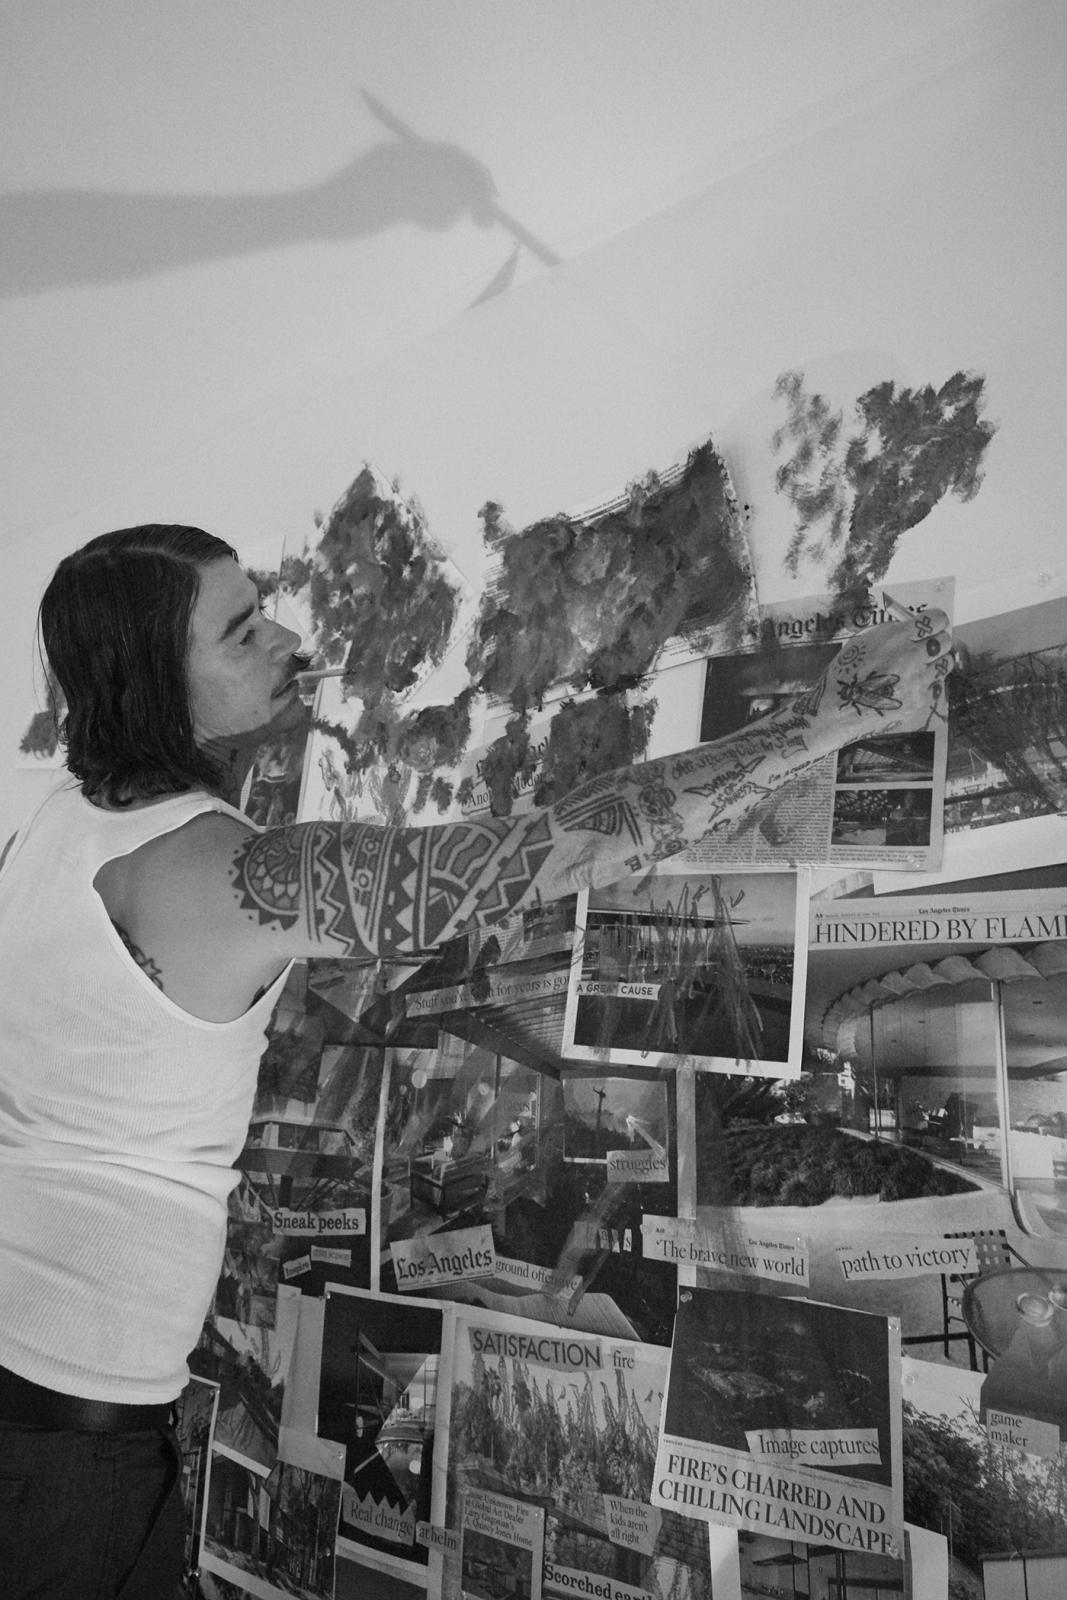 CATHERINE OPIE, Artist #2 (The Modernist), 2016